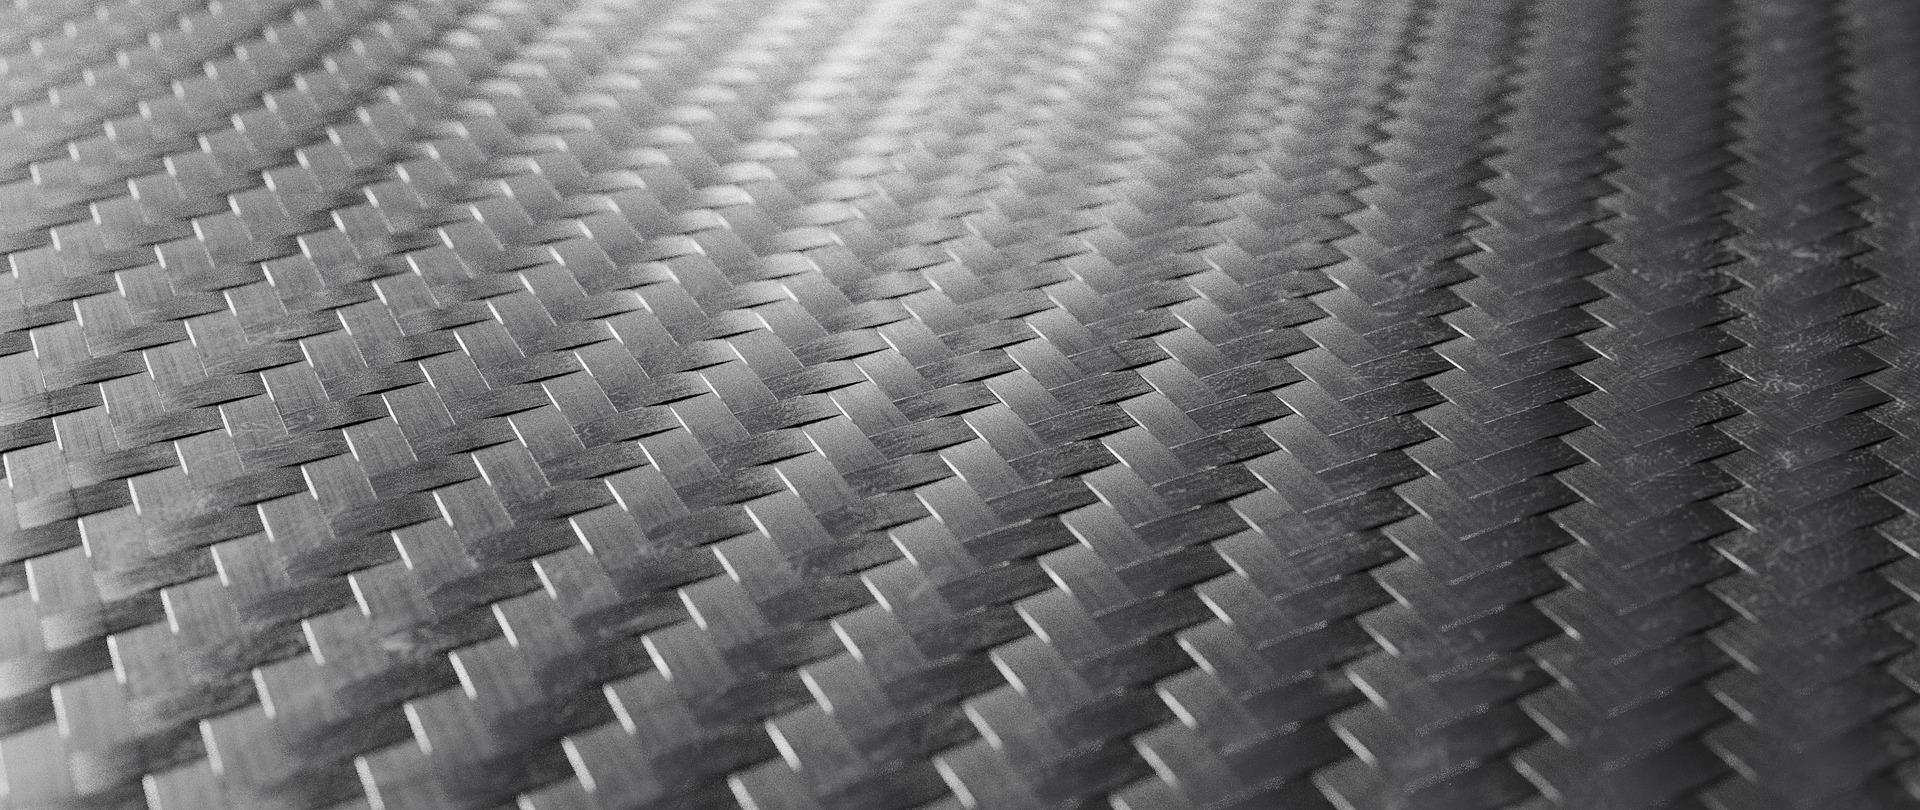 pattern-3216611_1920